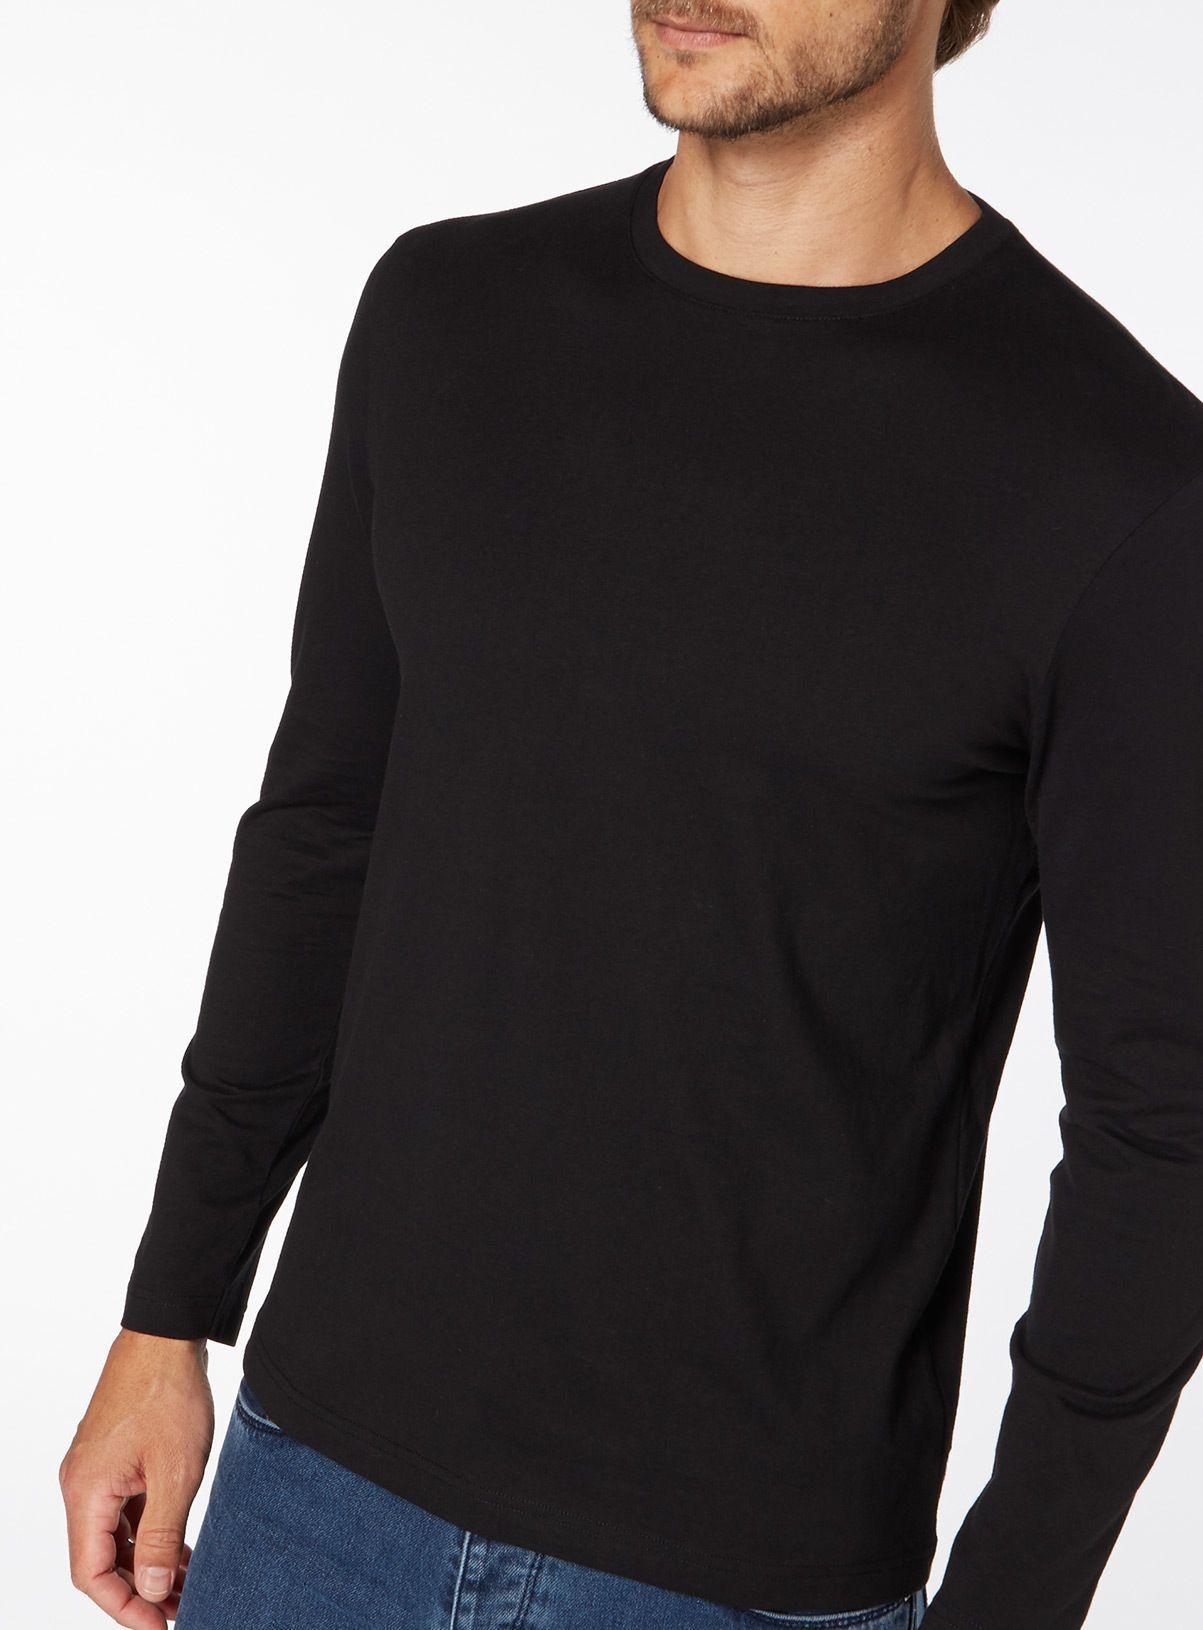 men black jeans at sainsbury's